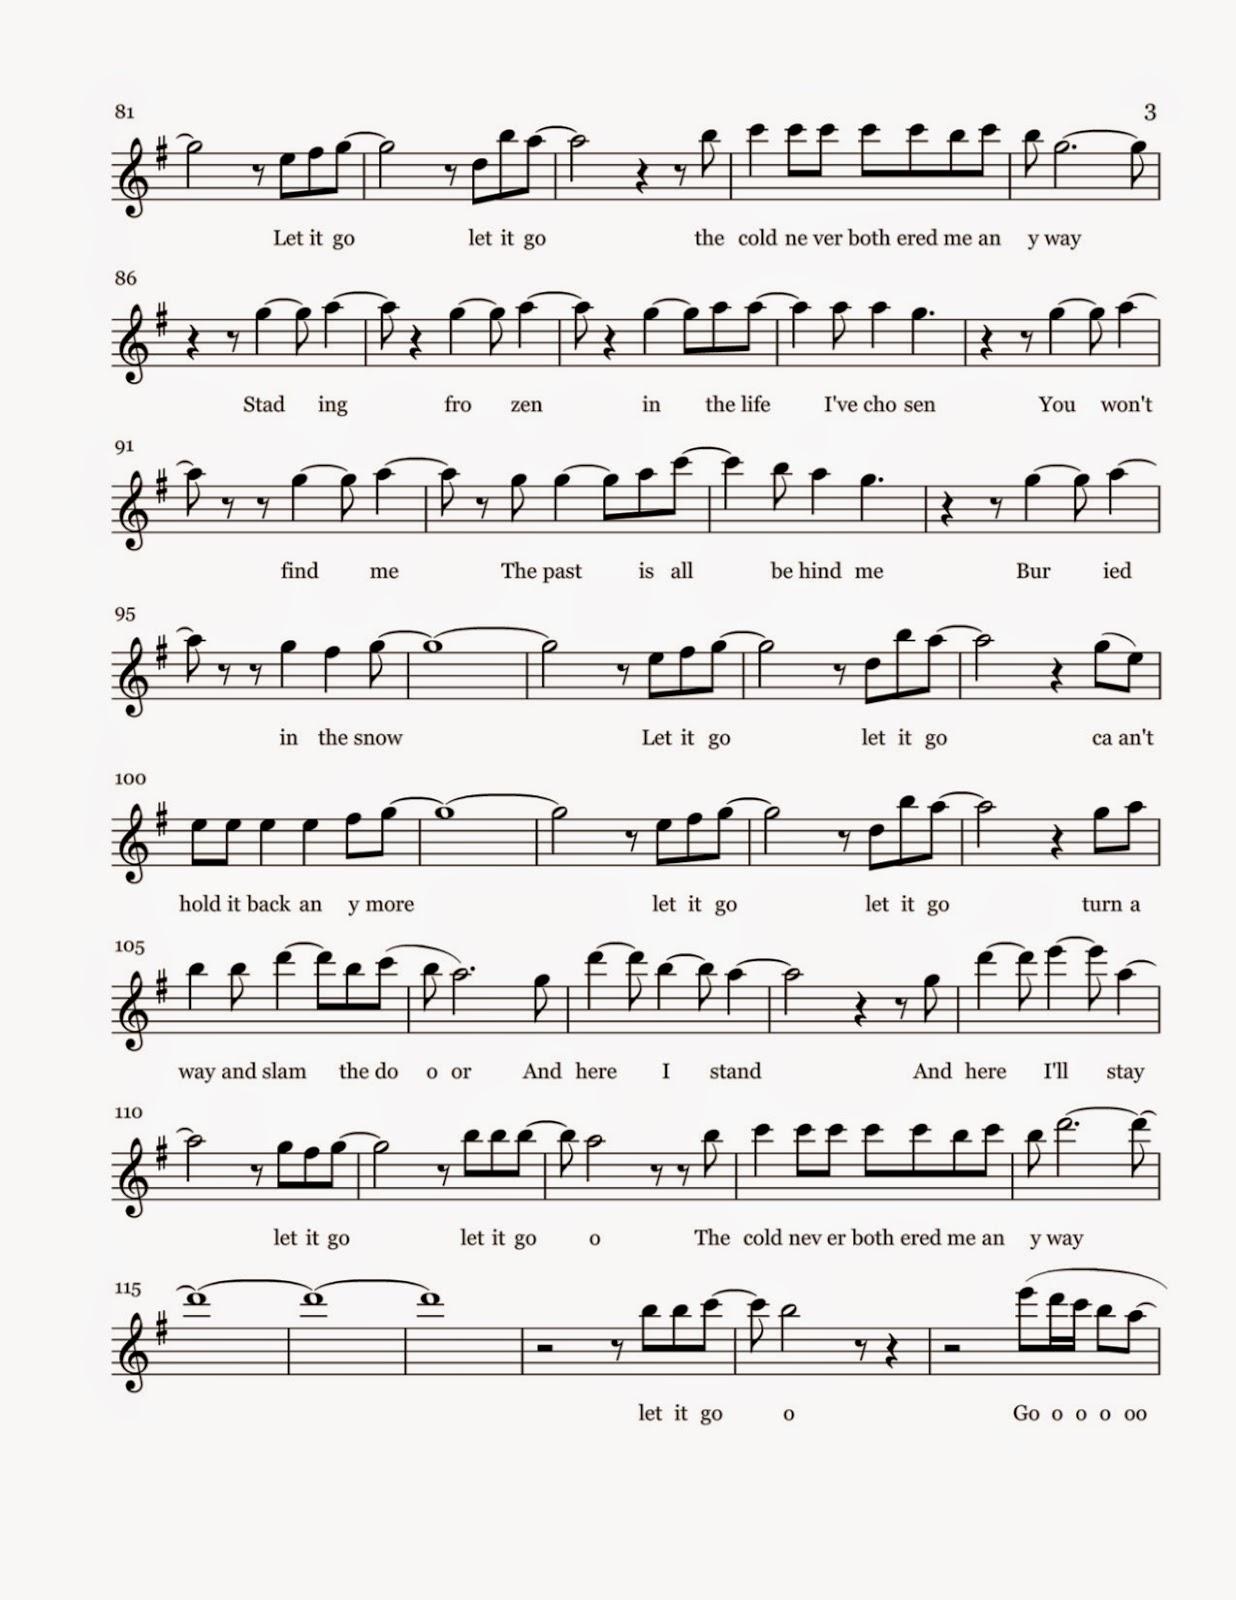 Flute sheet music let it go sheet music pdf download hexwebz Images